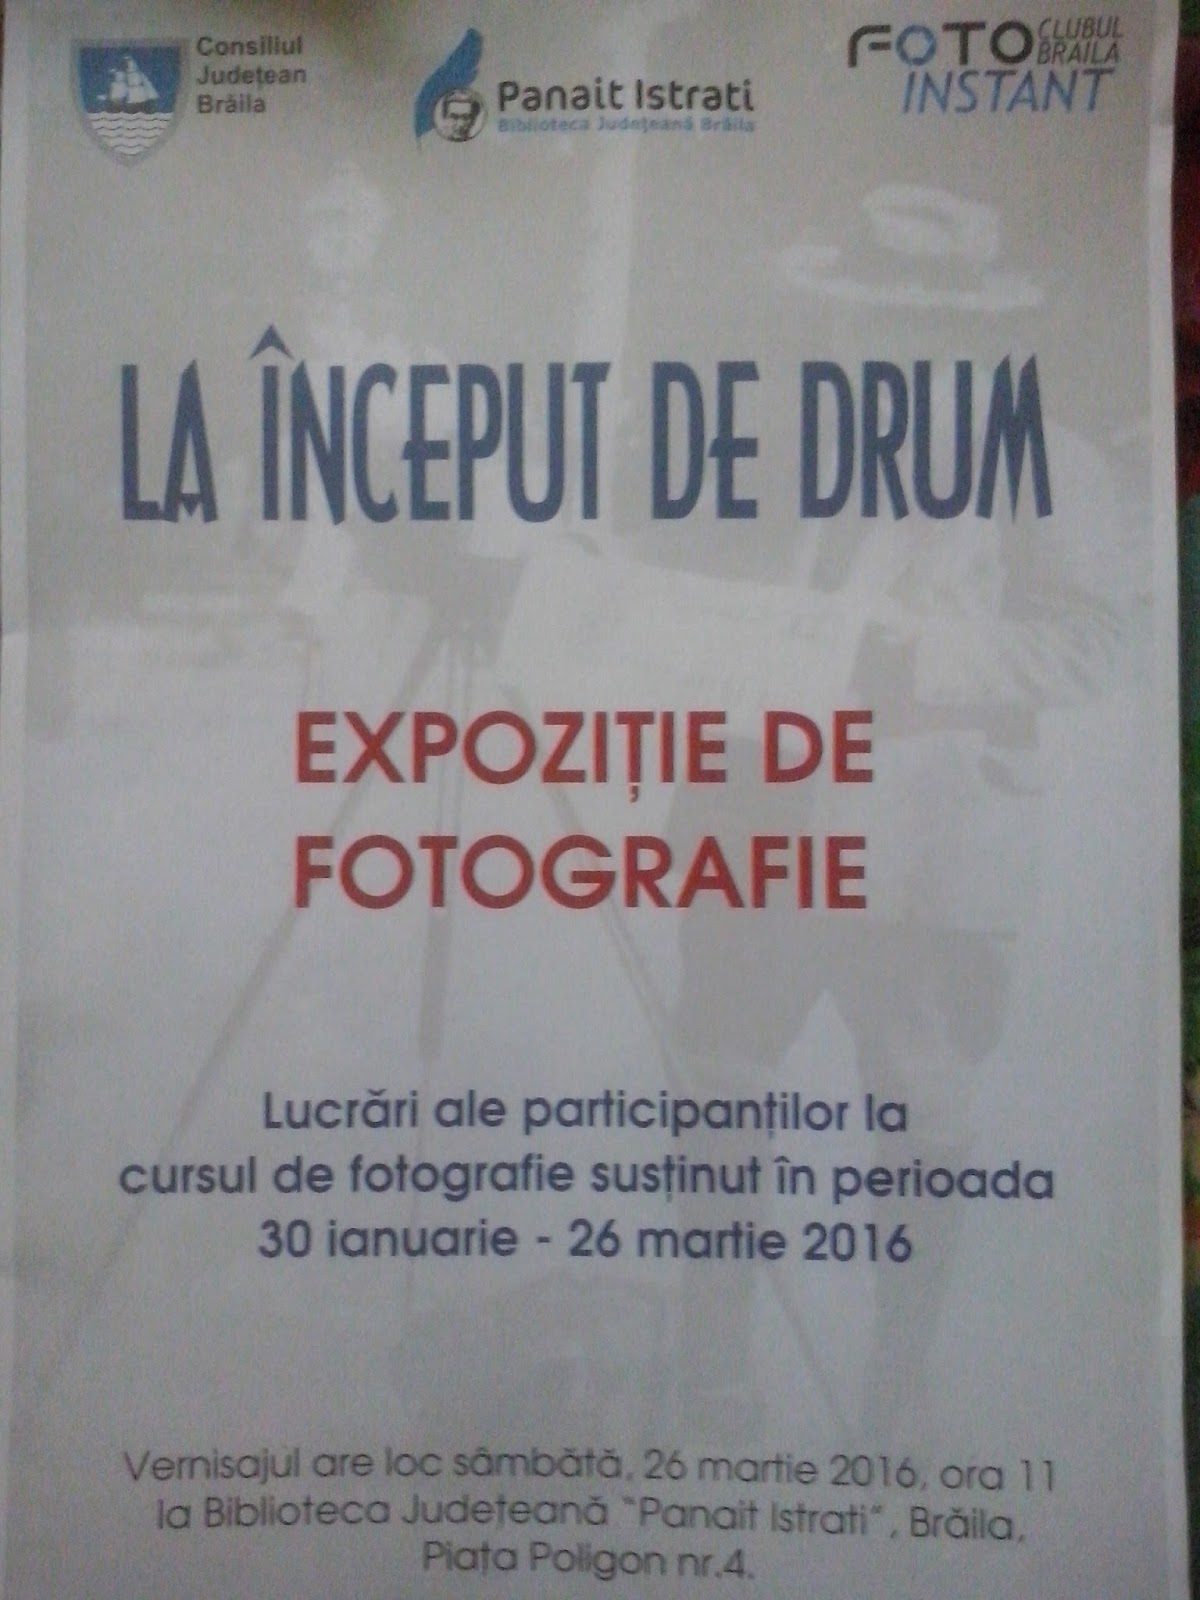 foto instant - expozitie Braila